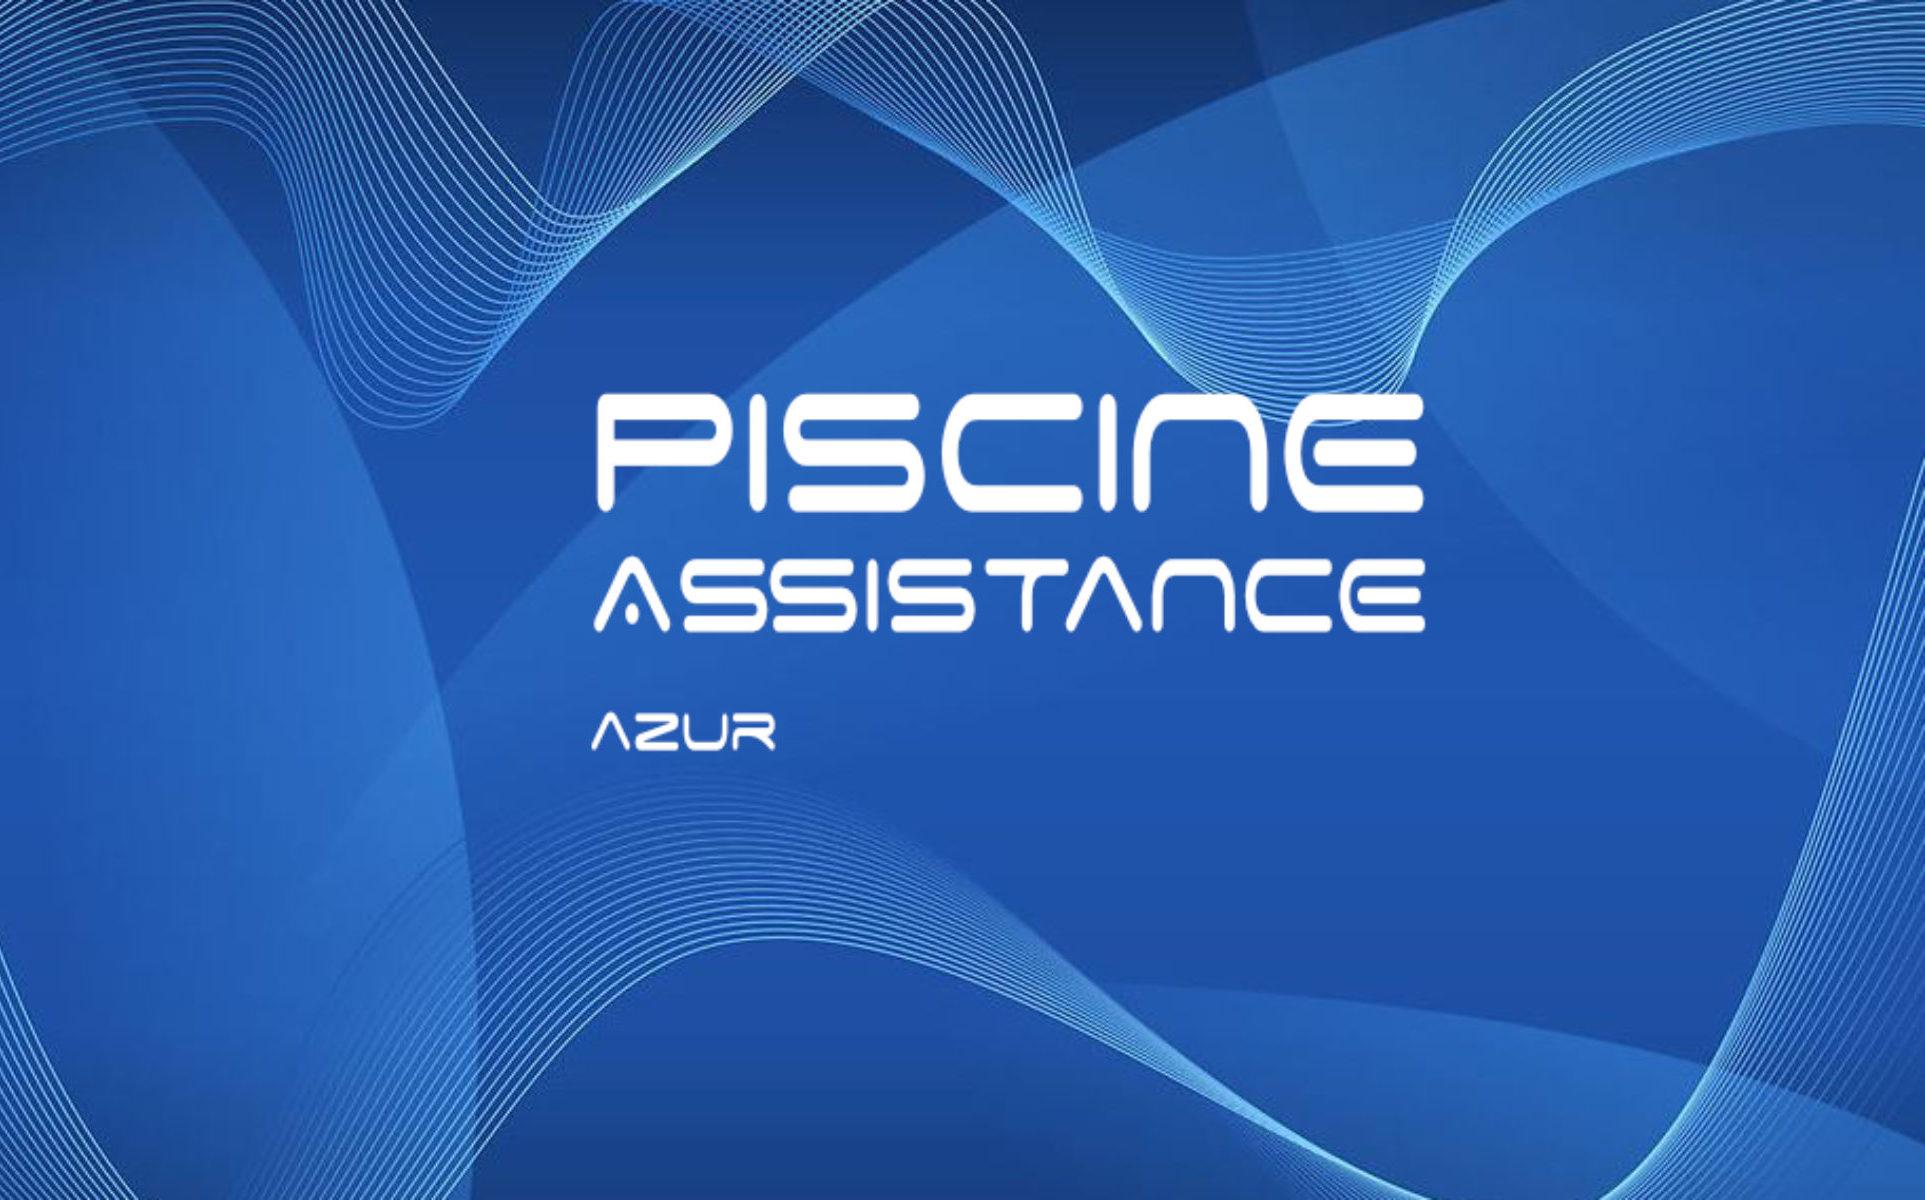 Piscine Assistance Azur